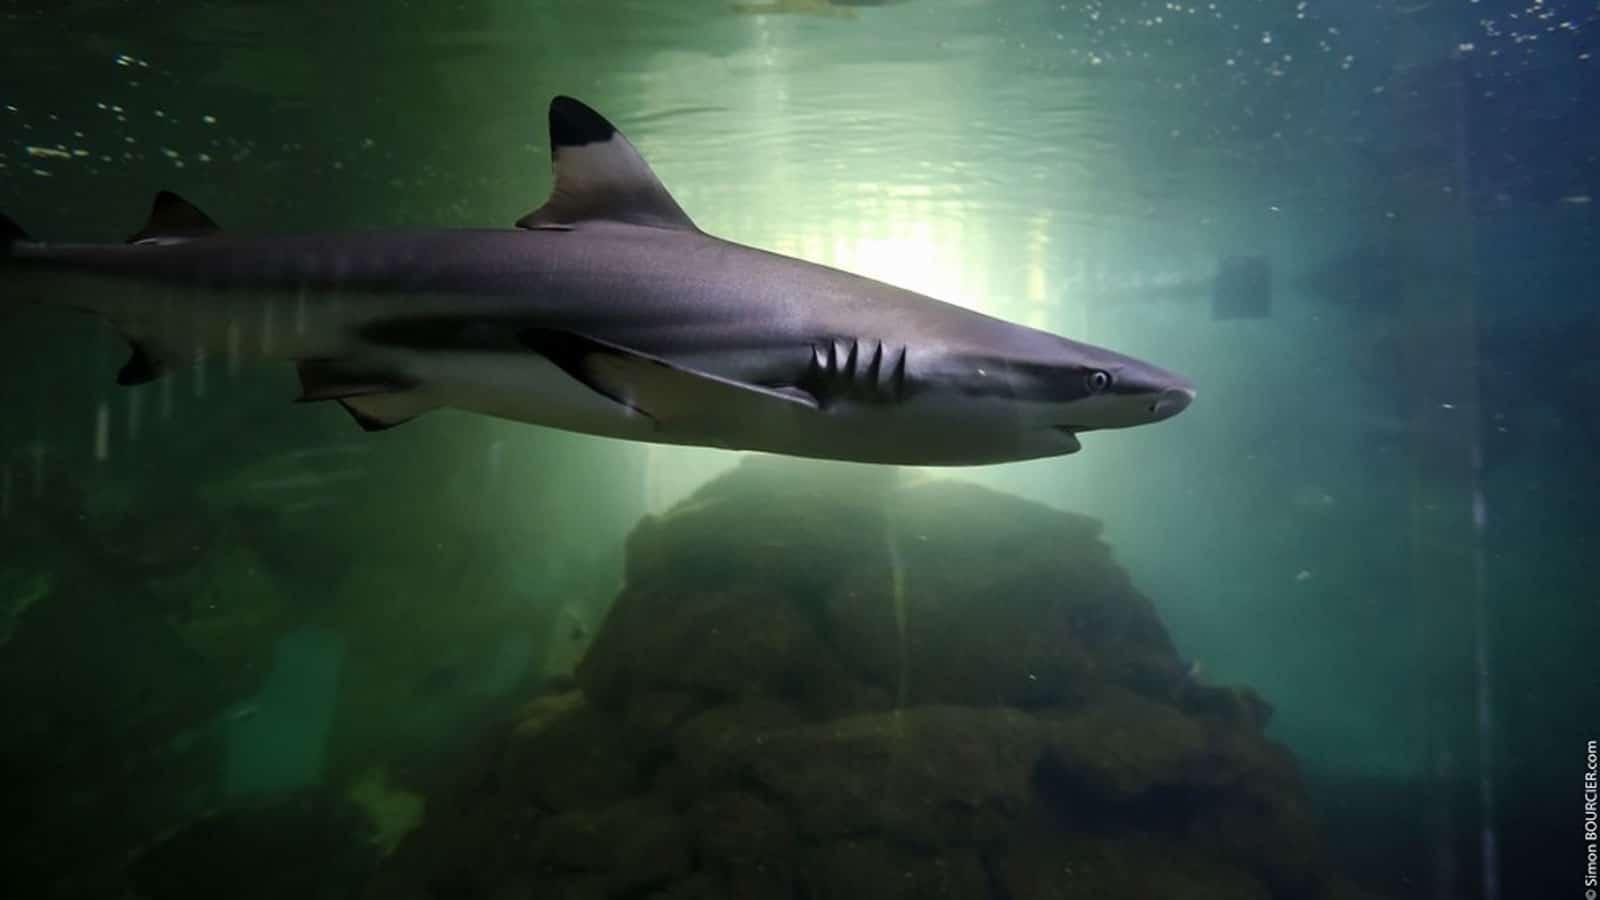 sightseeing-vendee-aquarium-SimonBOURCIER